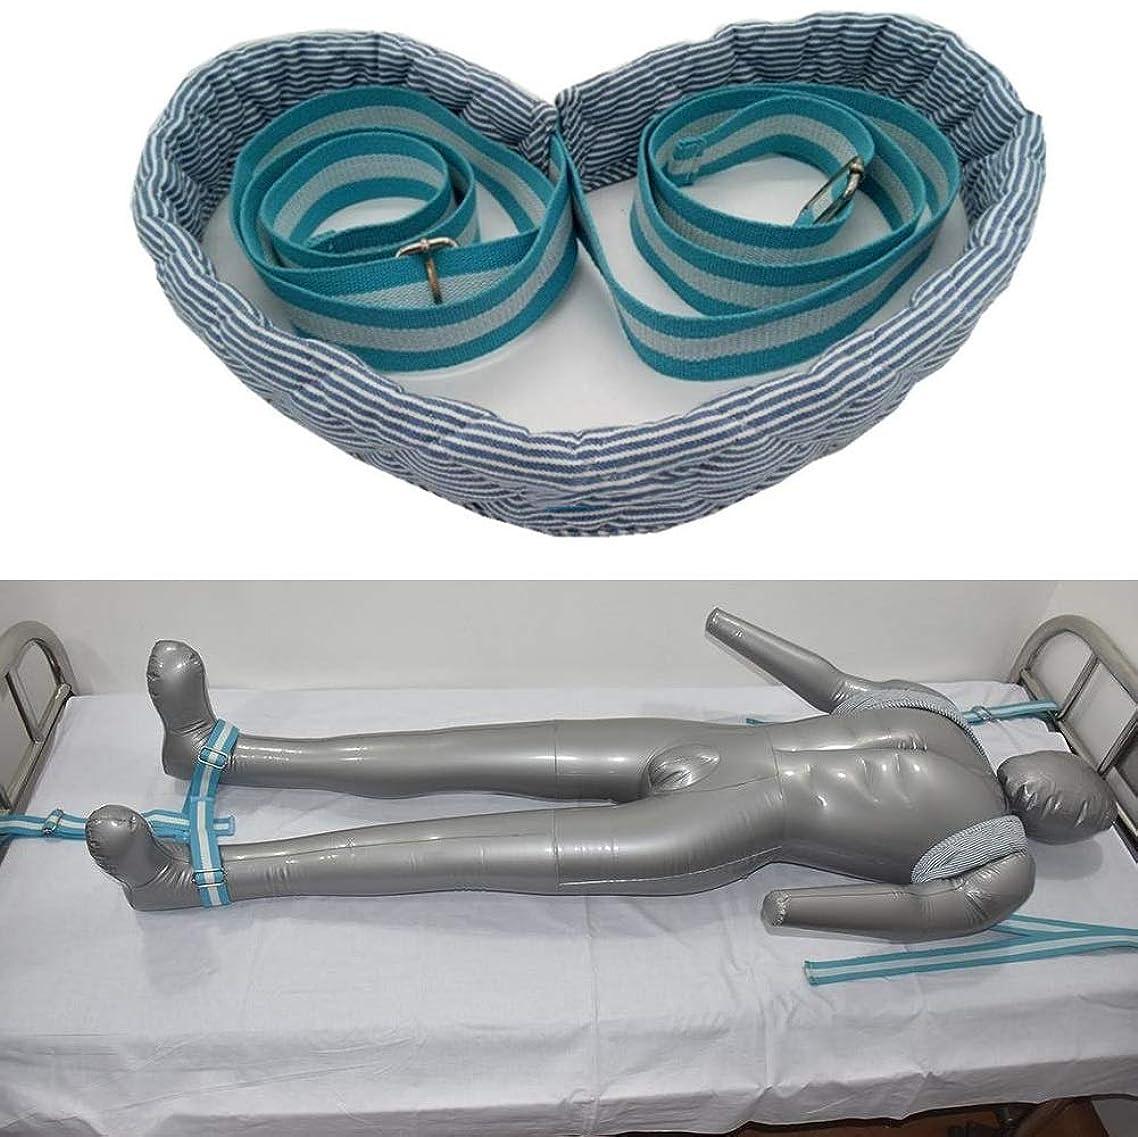 YxnGu Medical Adjustable Patients Constraint Band - Upper & Lower Limbs Restraint Band - Elderly Dementia Limb Holders(2-Piece Set)